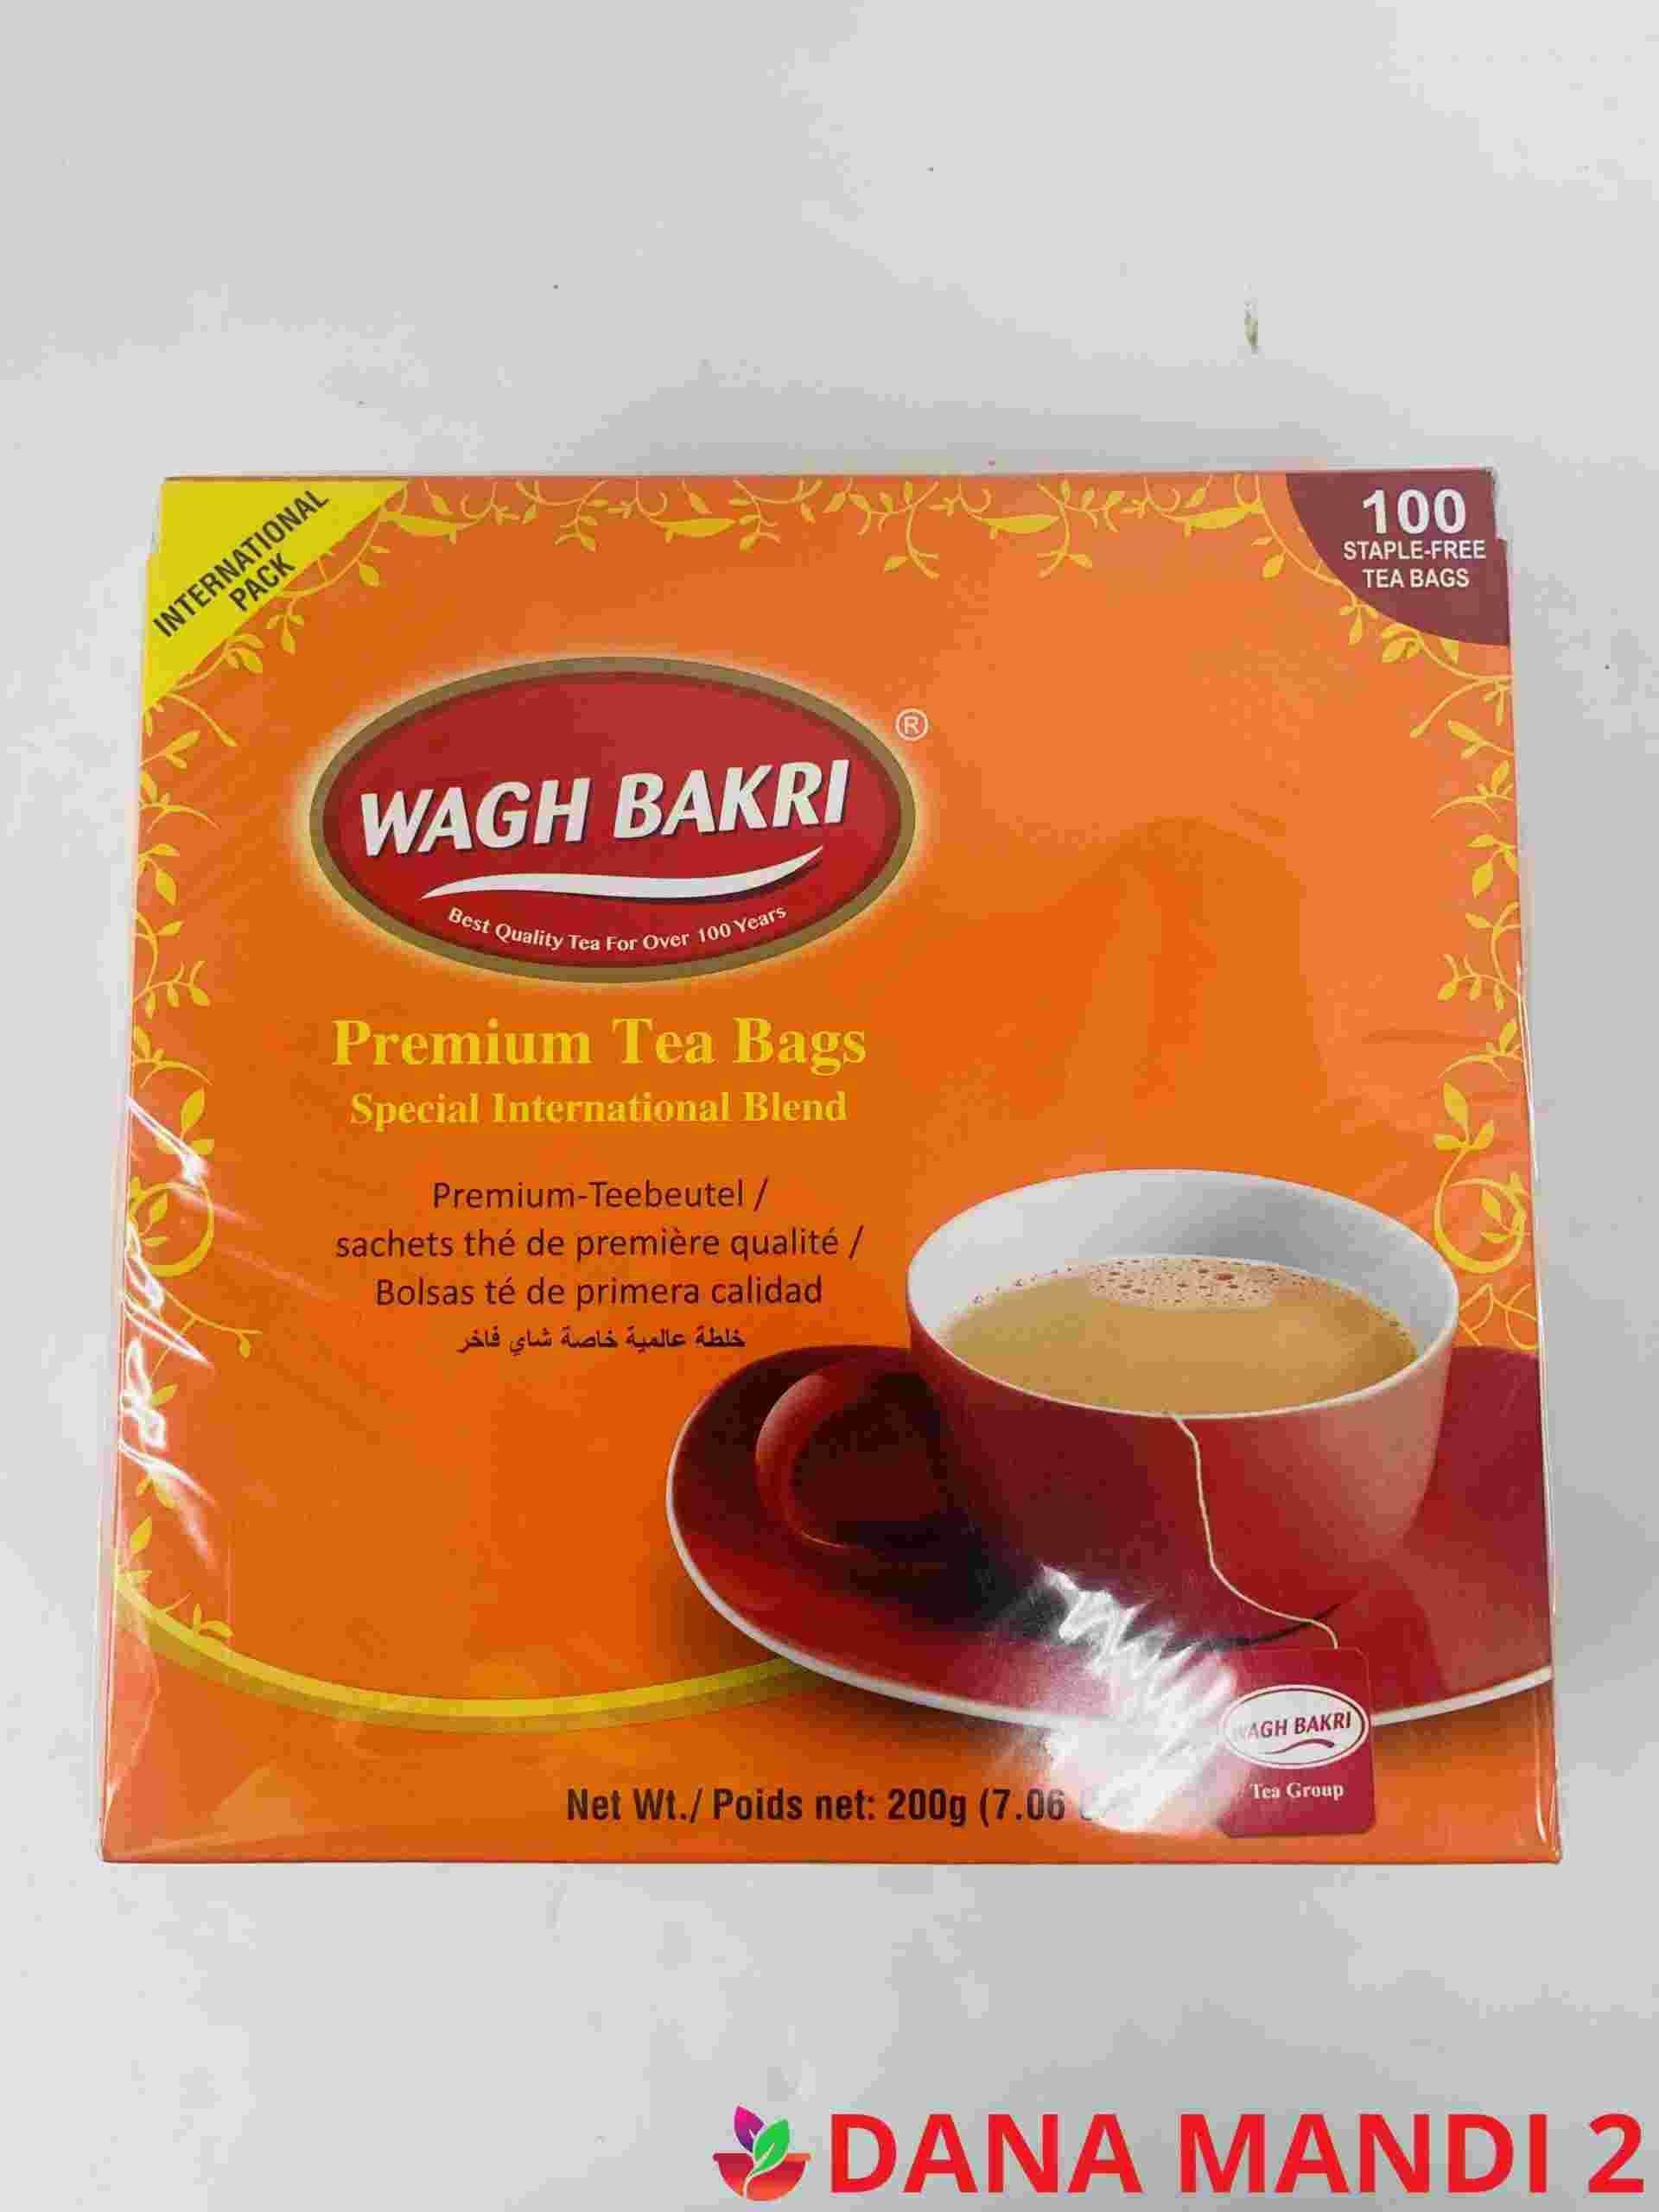 WAGH BAKRI Wagh Bakri Tea Bags